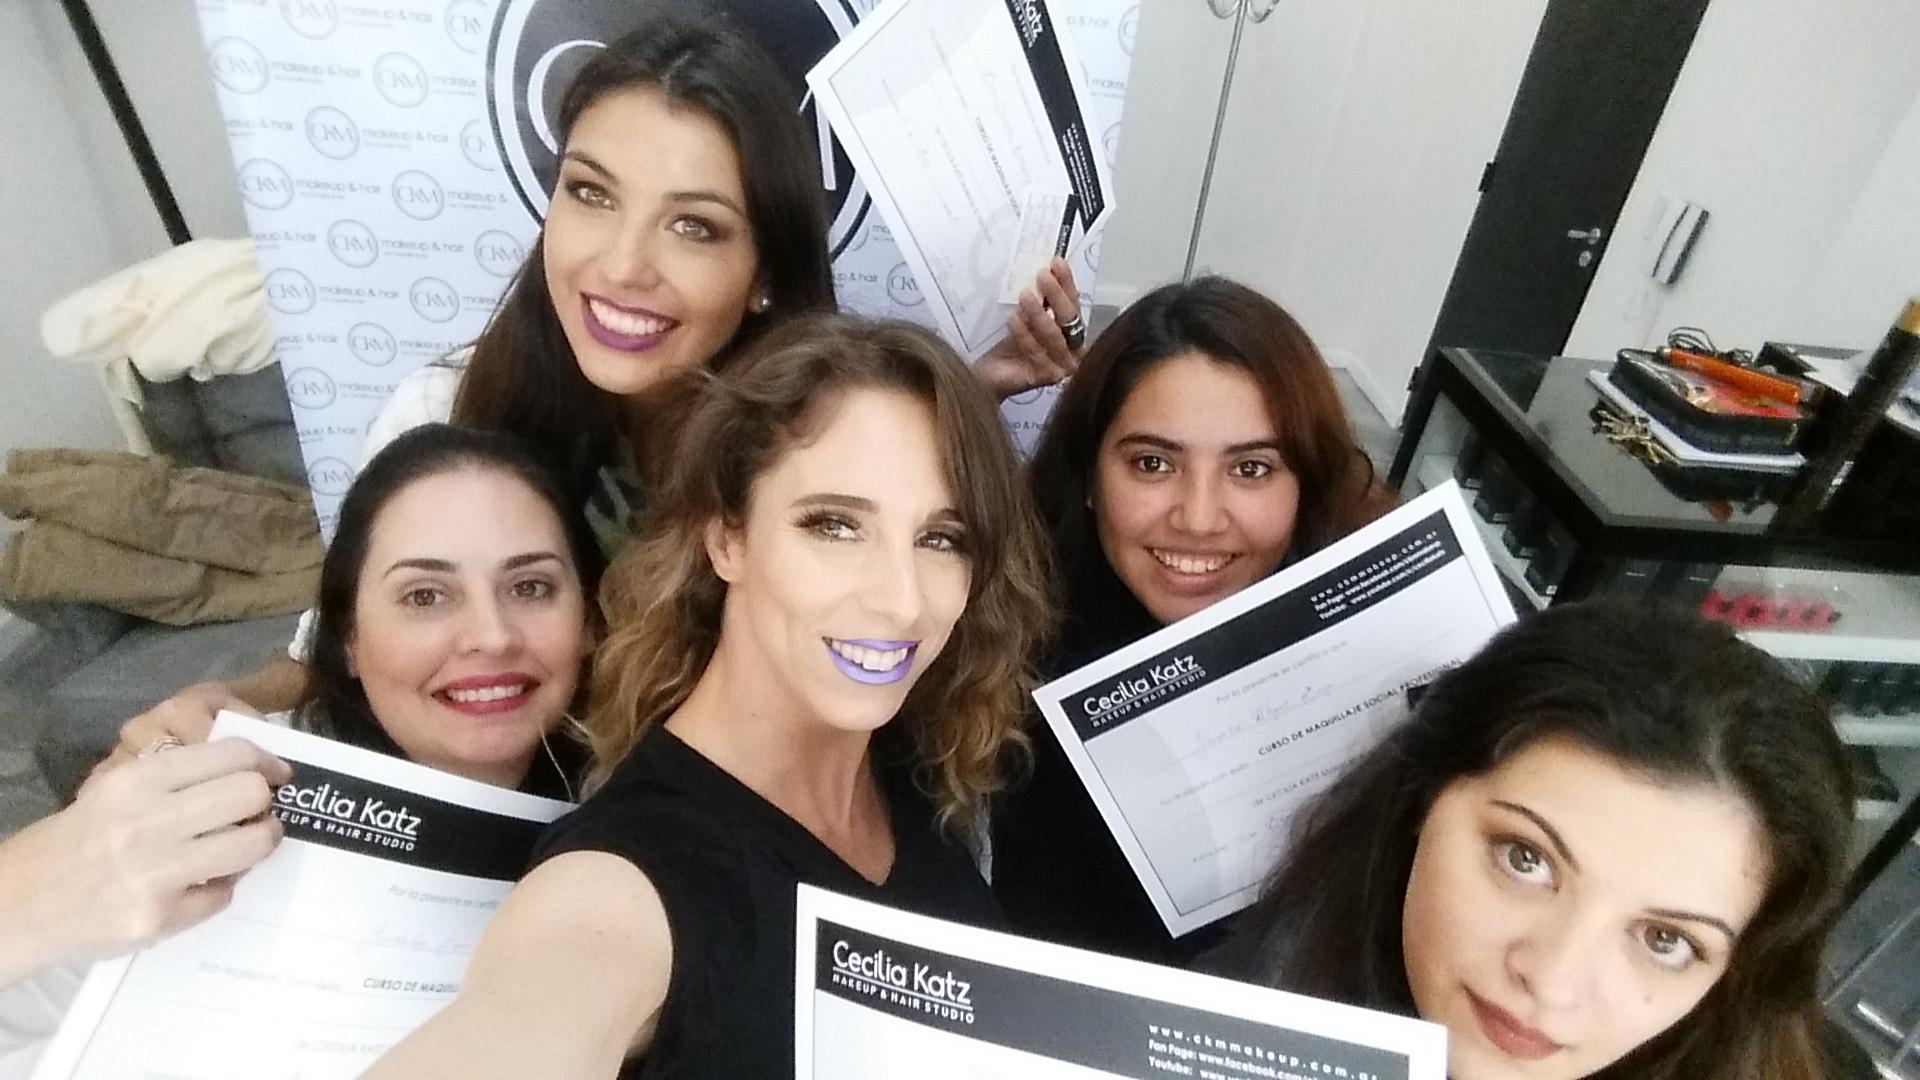 59c9d6f37 Inscripción al Curso de maquillaje social profesional intensivo - CkmMakeup